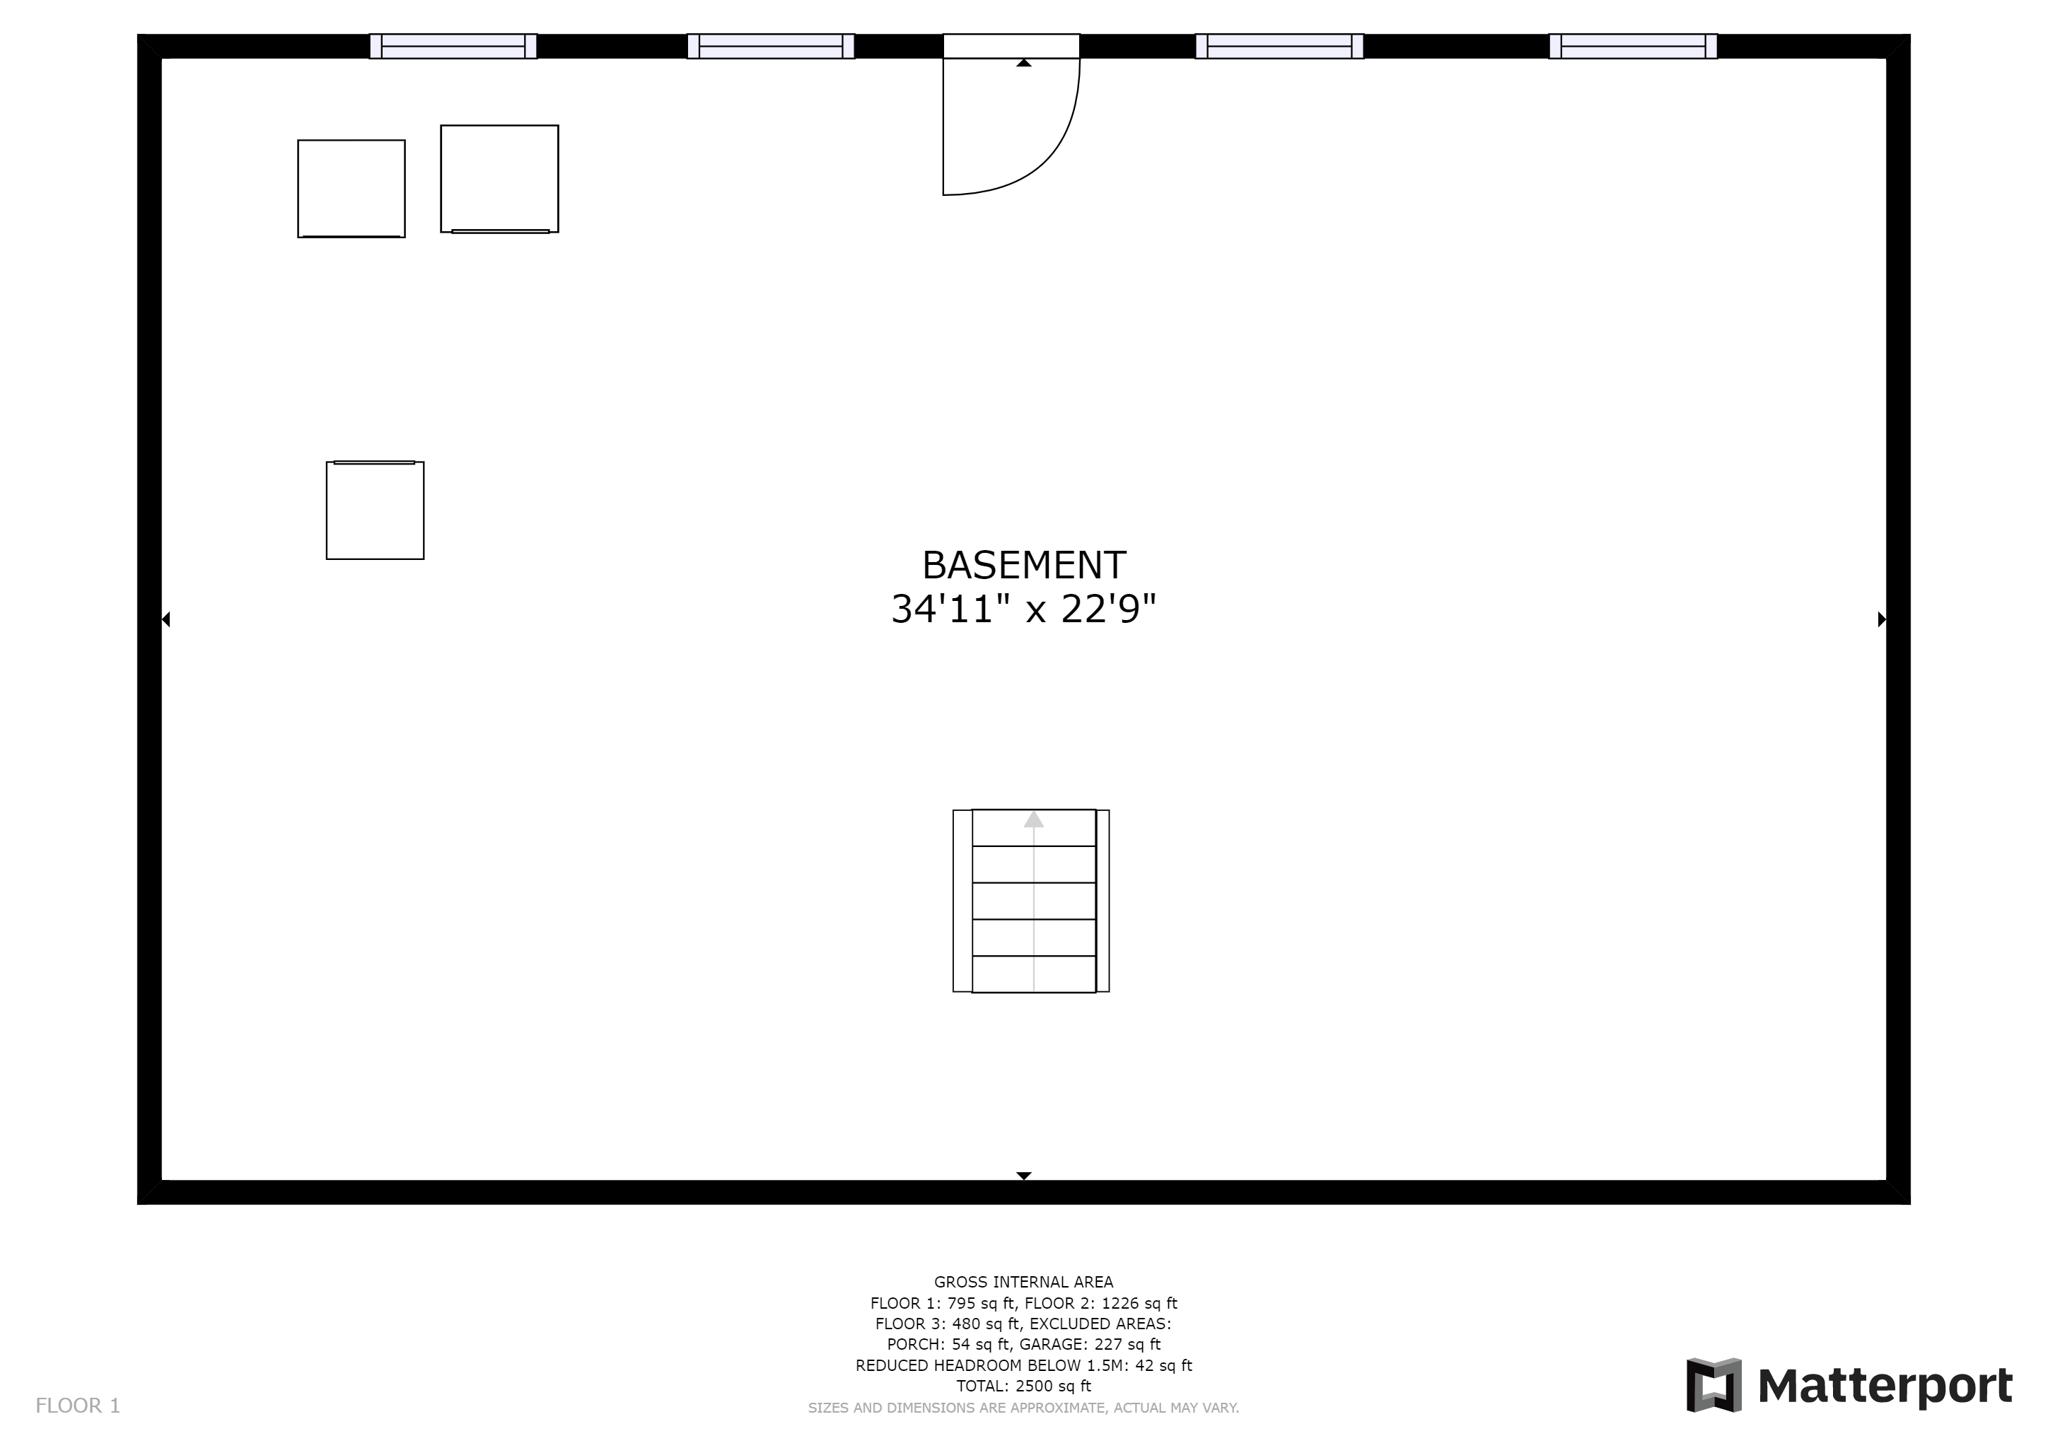 Floorplan #0